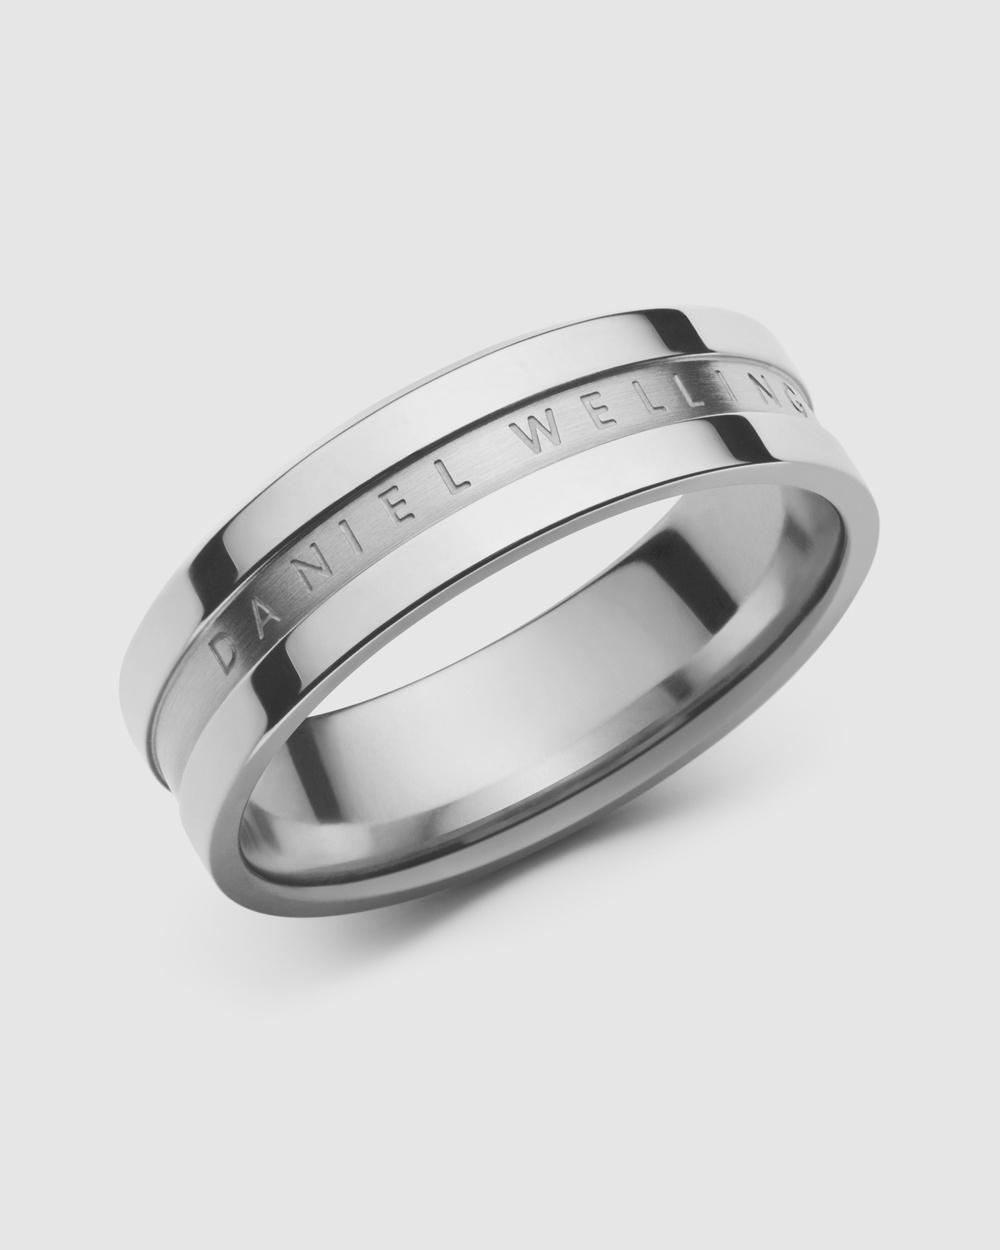 Daniel Wellington Elan Ring Jewellery Silver